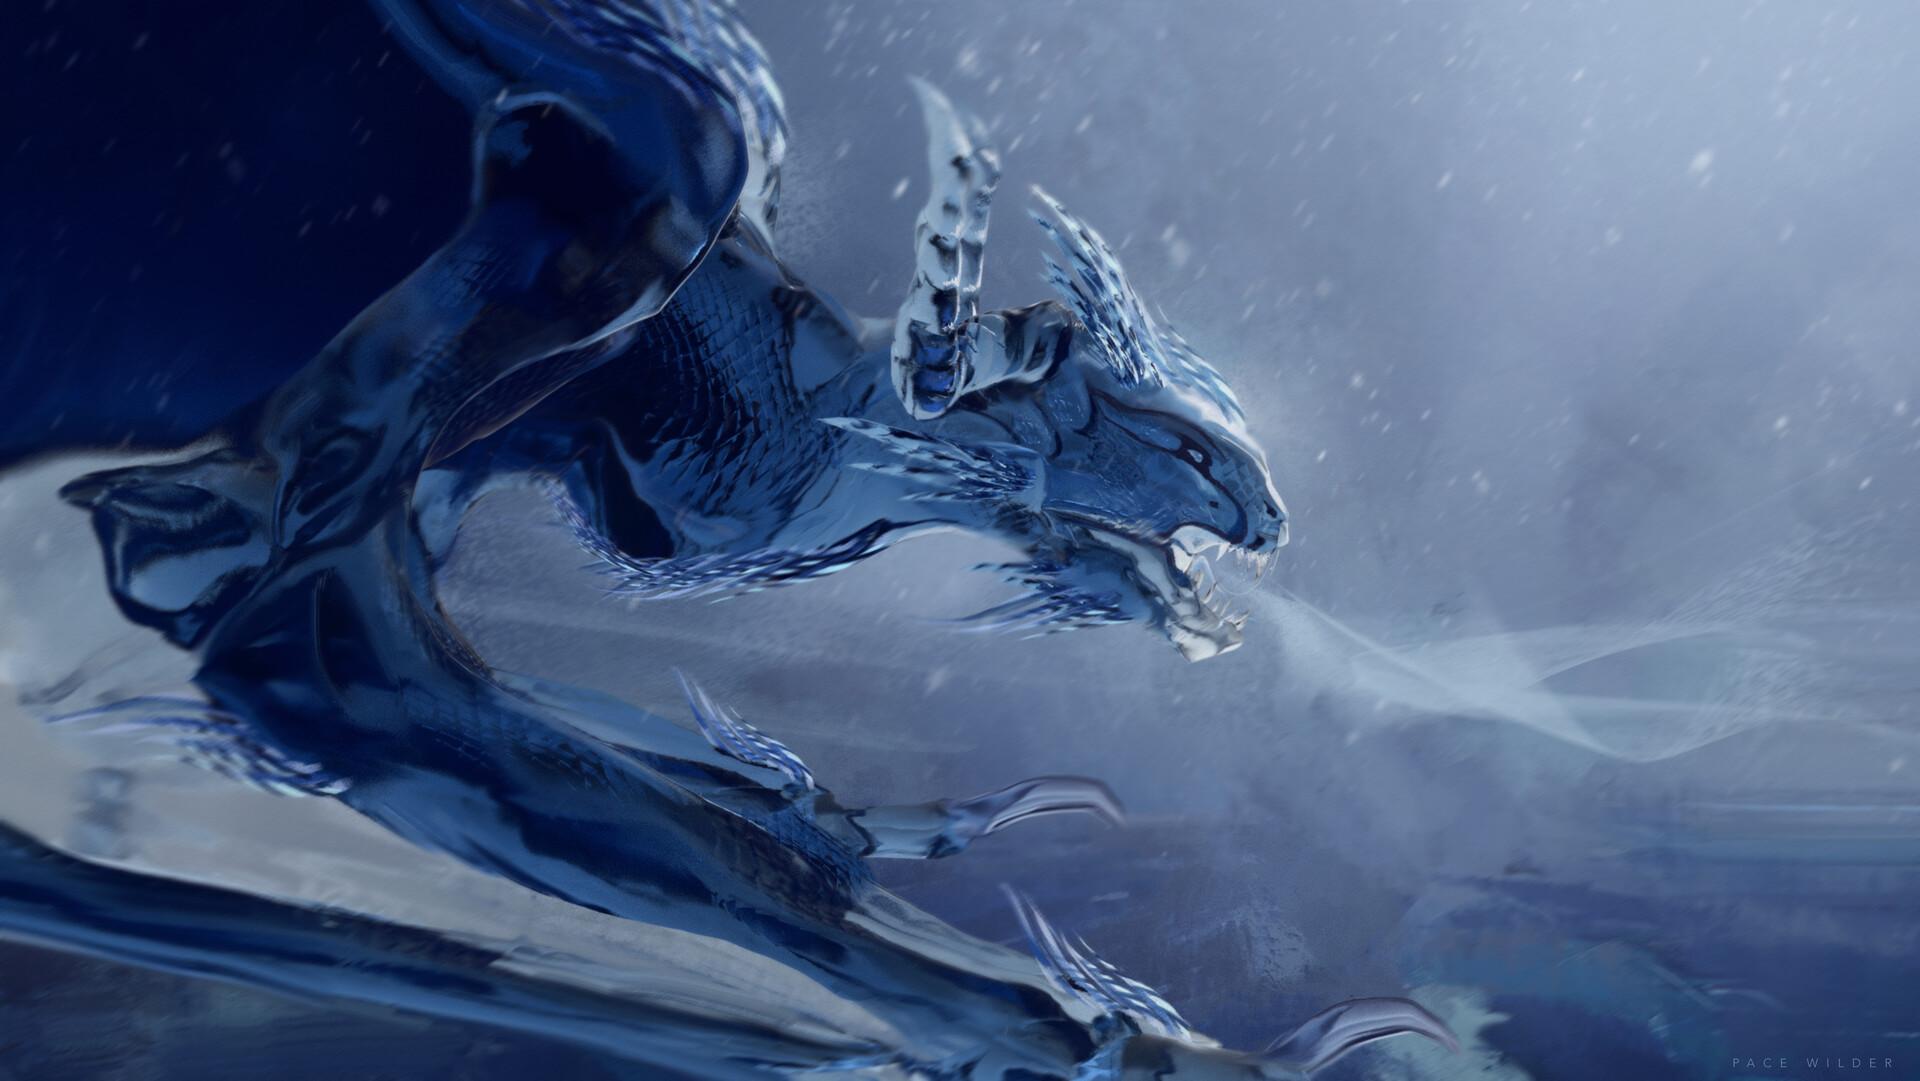 Pace wilder dragoncloseup10